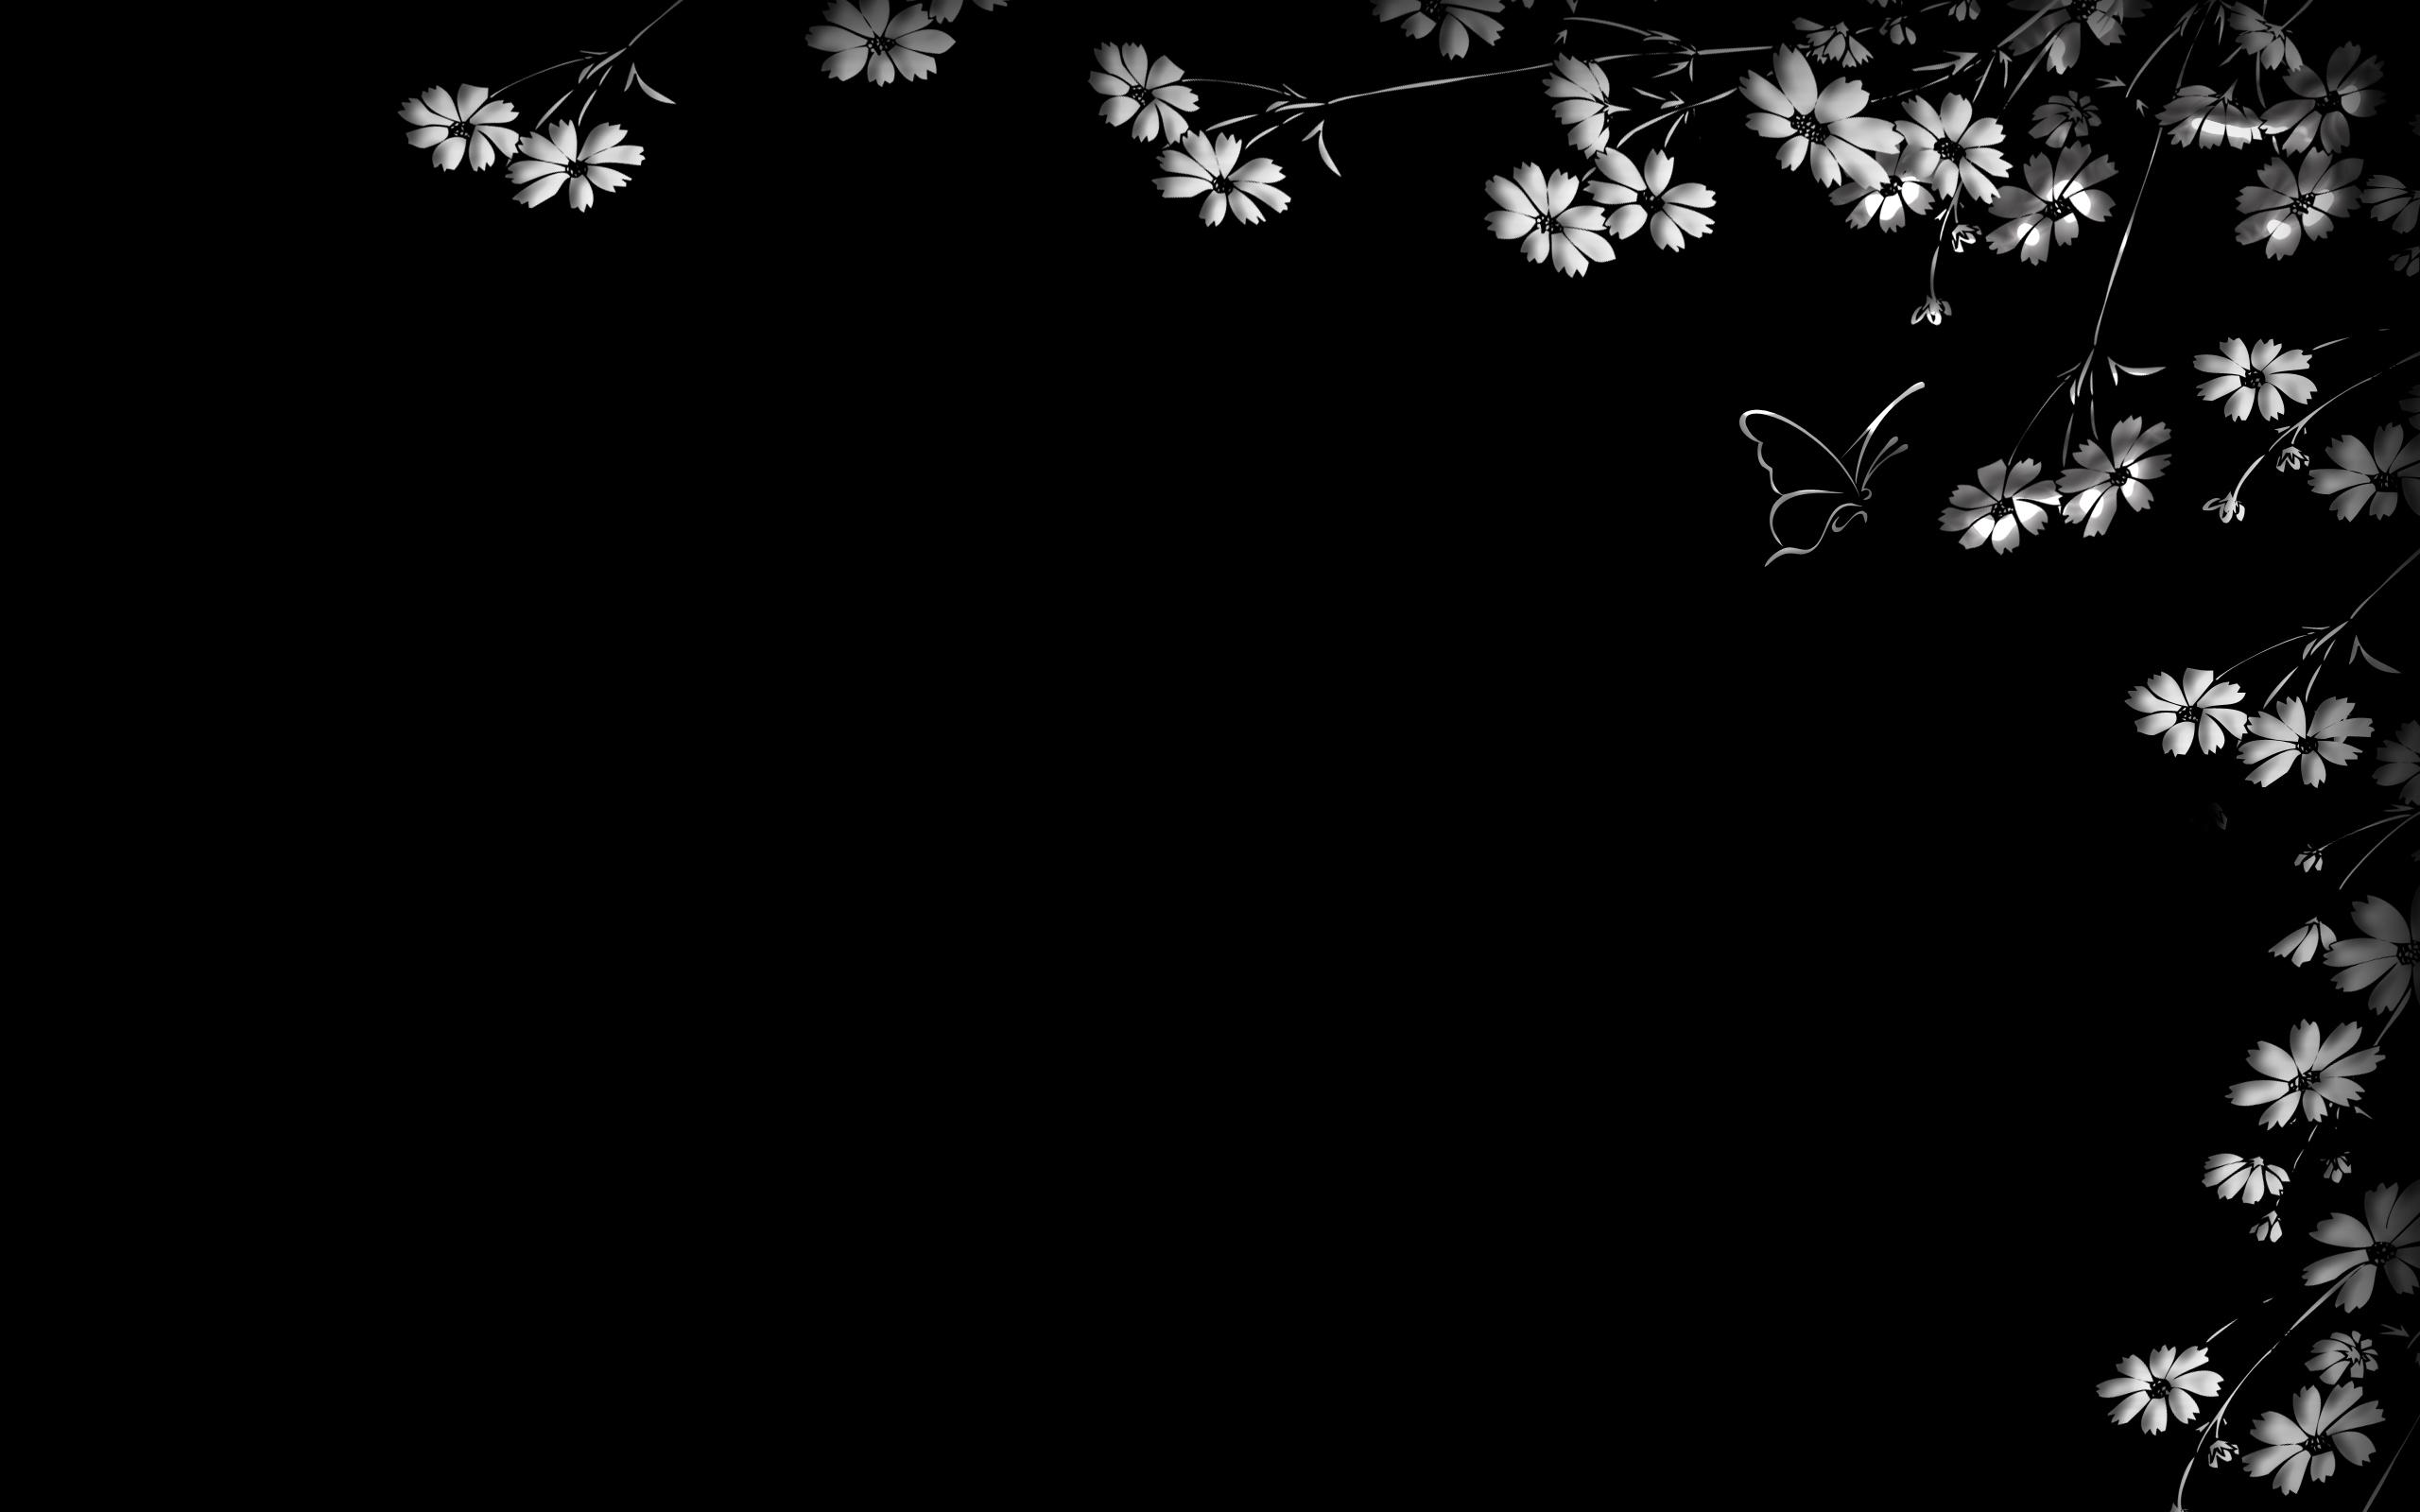 Black Flowers Lyrics 5 Wide Wallpaper Hdflowerwallpaper